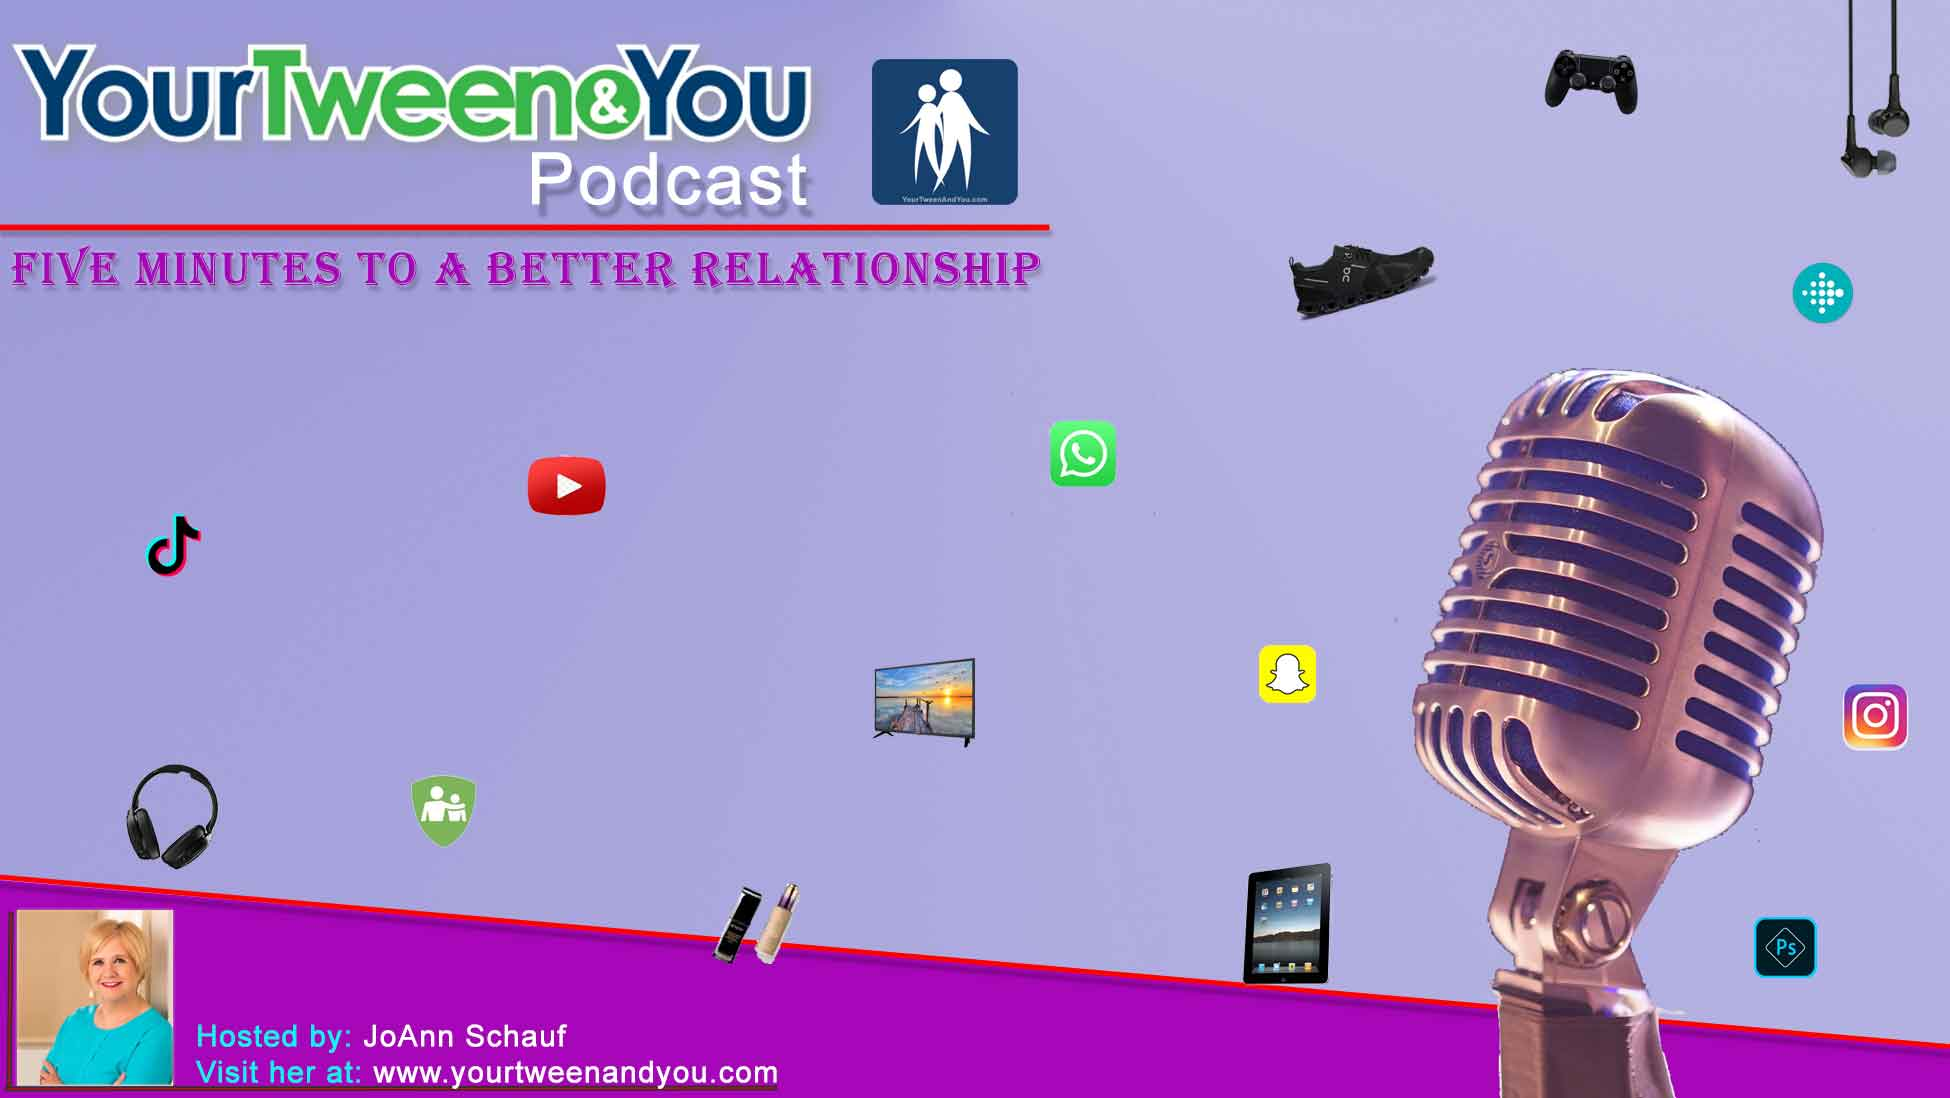 image design for podcast